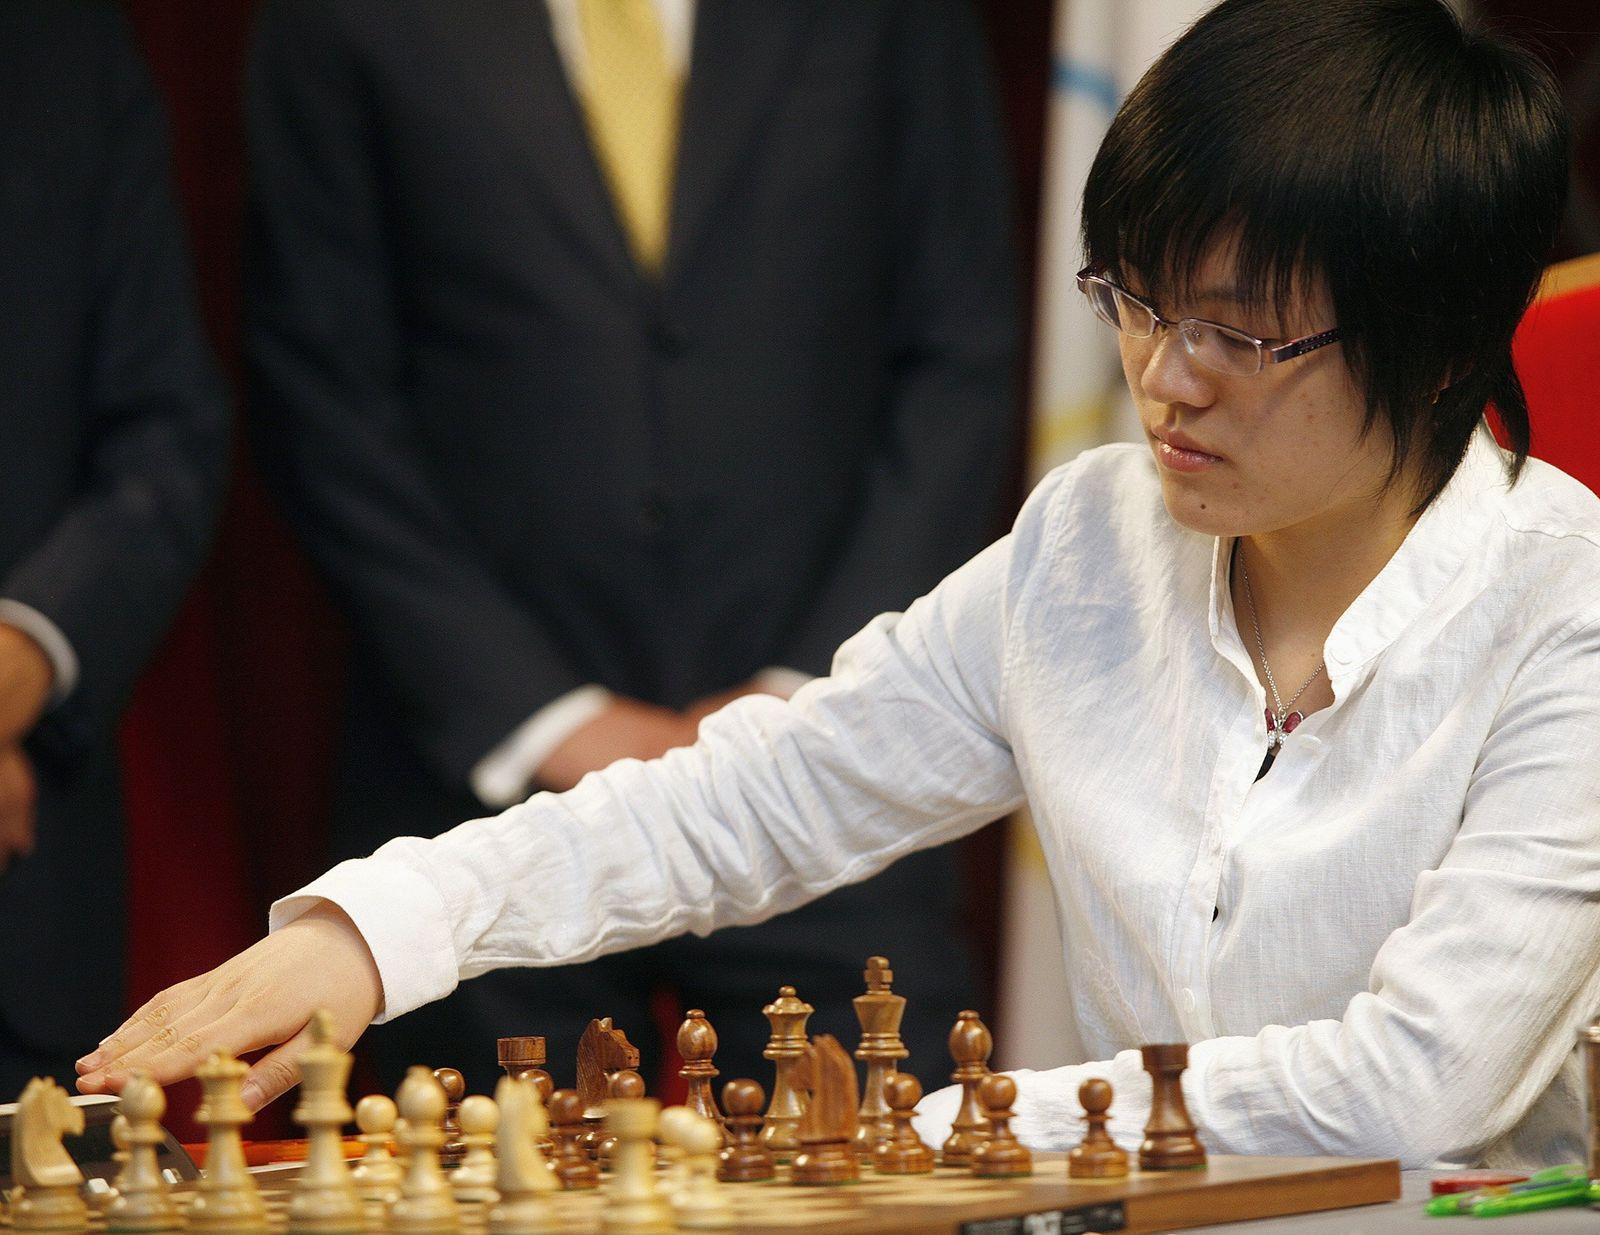 China's grandmaster Hou makes a move during her game against India's grandmaster Koneru in Tirana